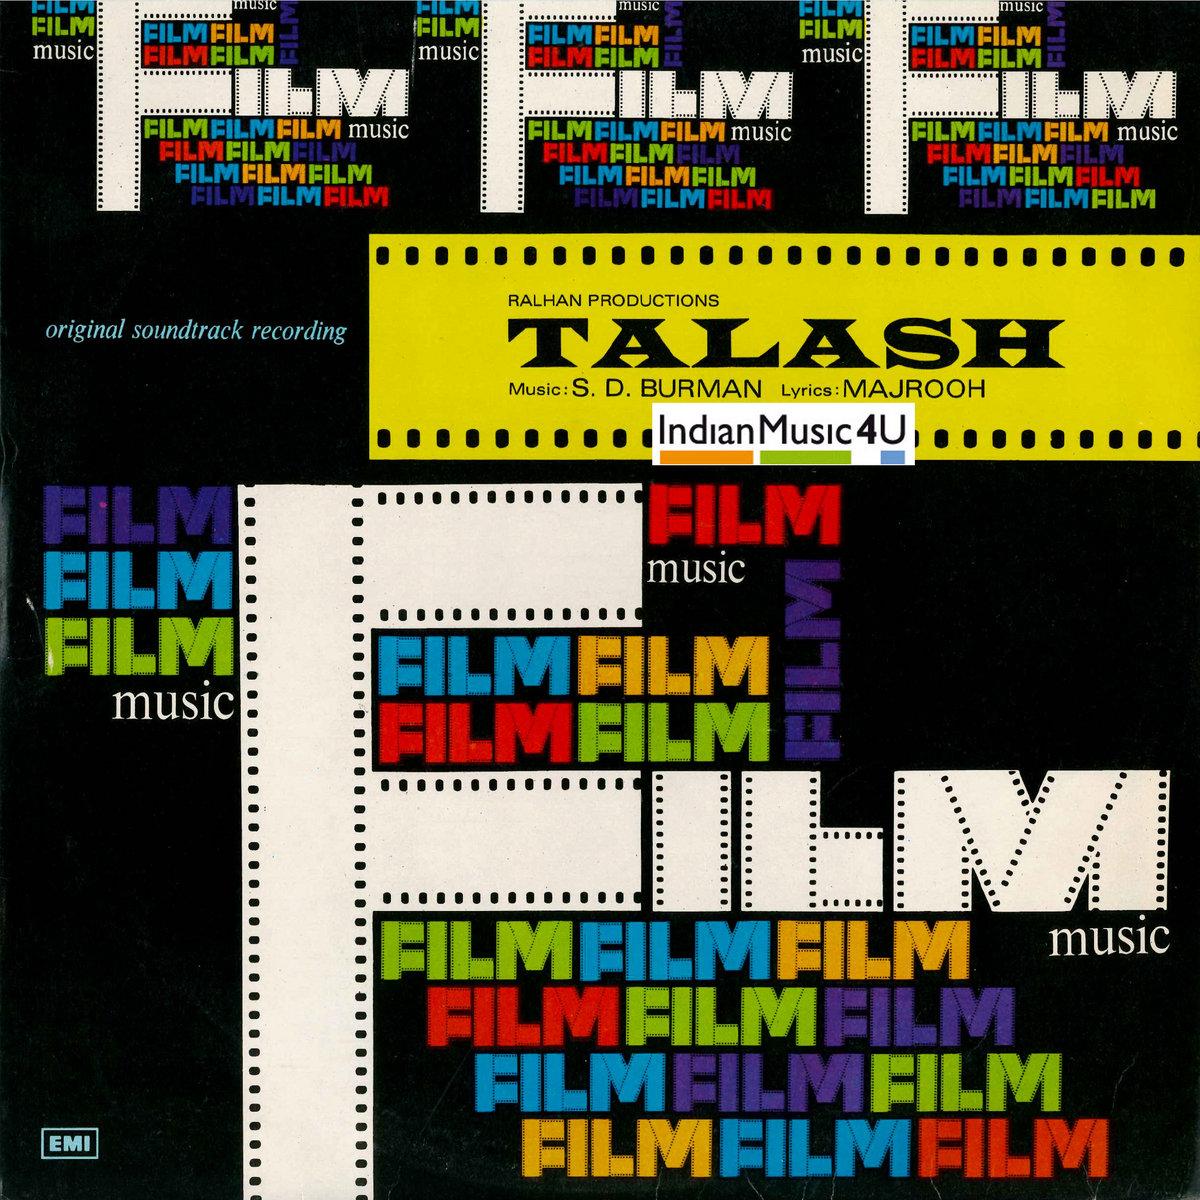 Masoom movie mp4 songs download.